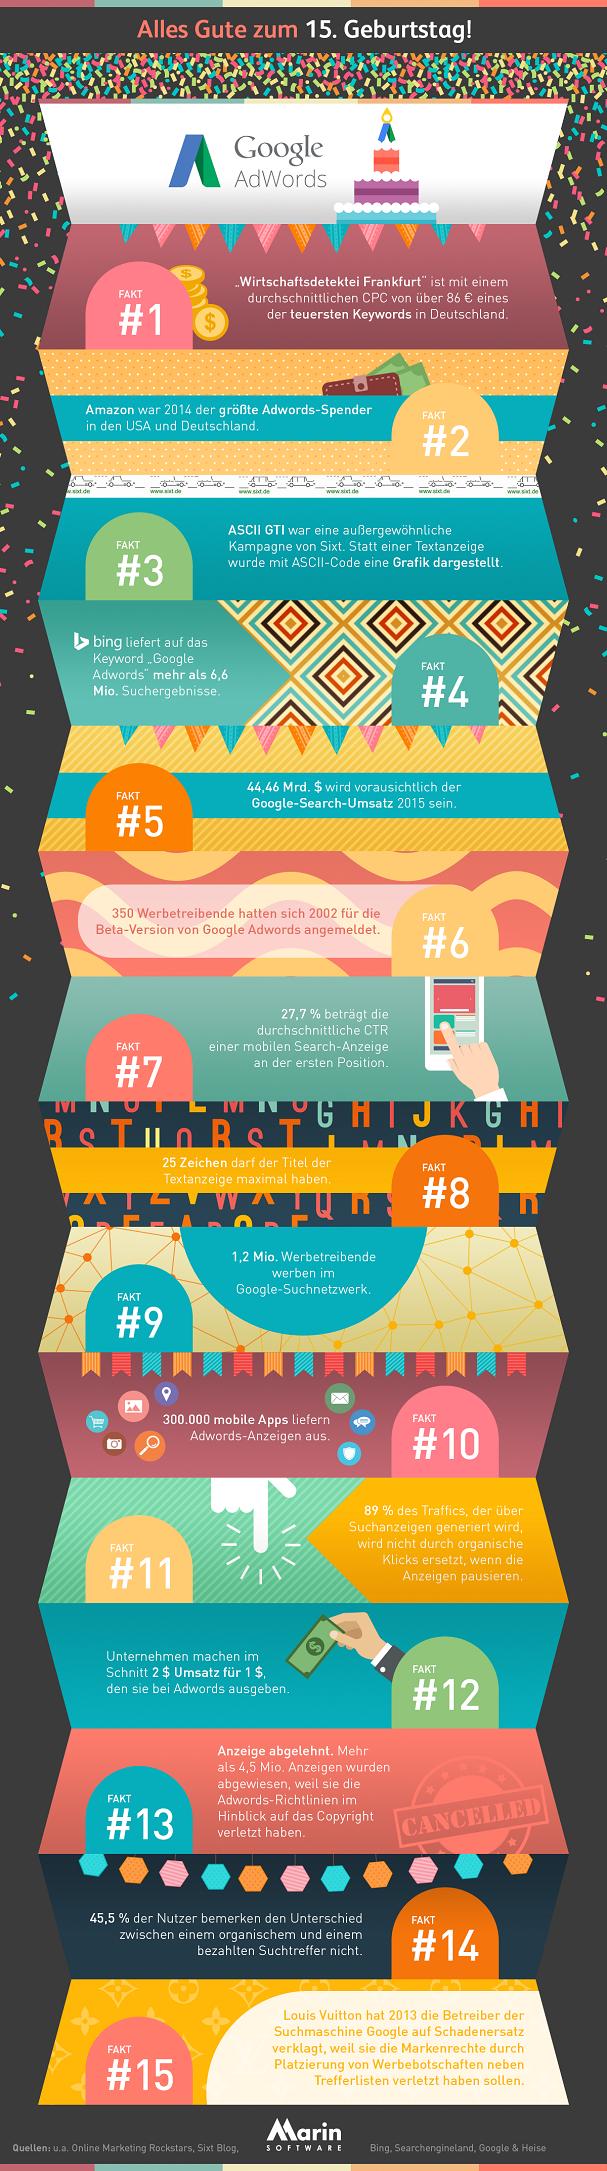 15-jahre-adwords-infografik